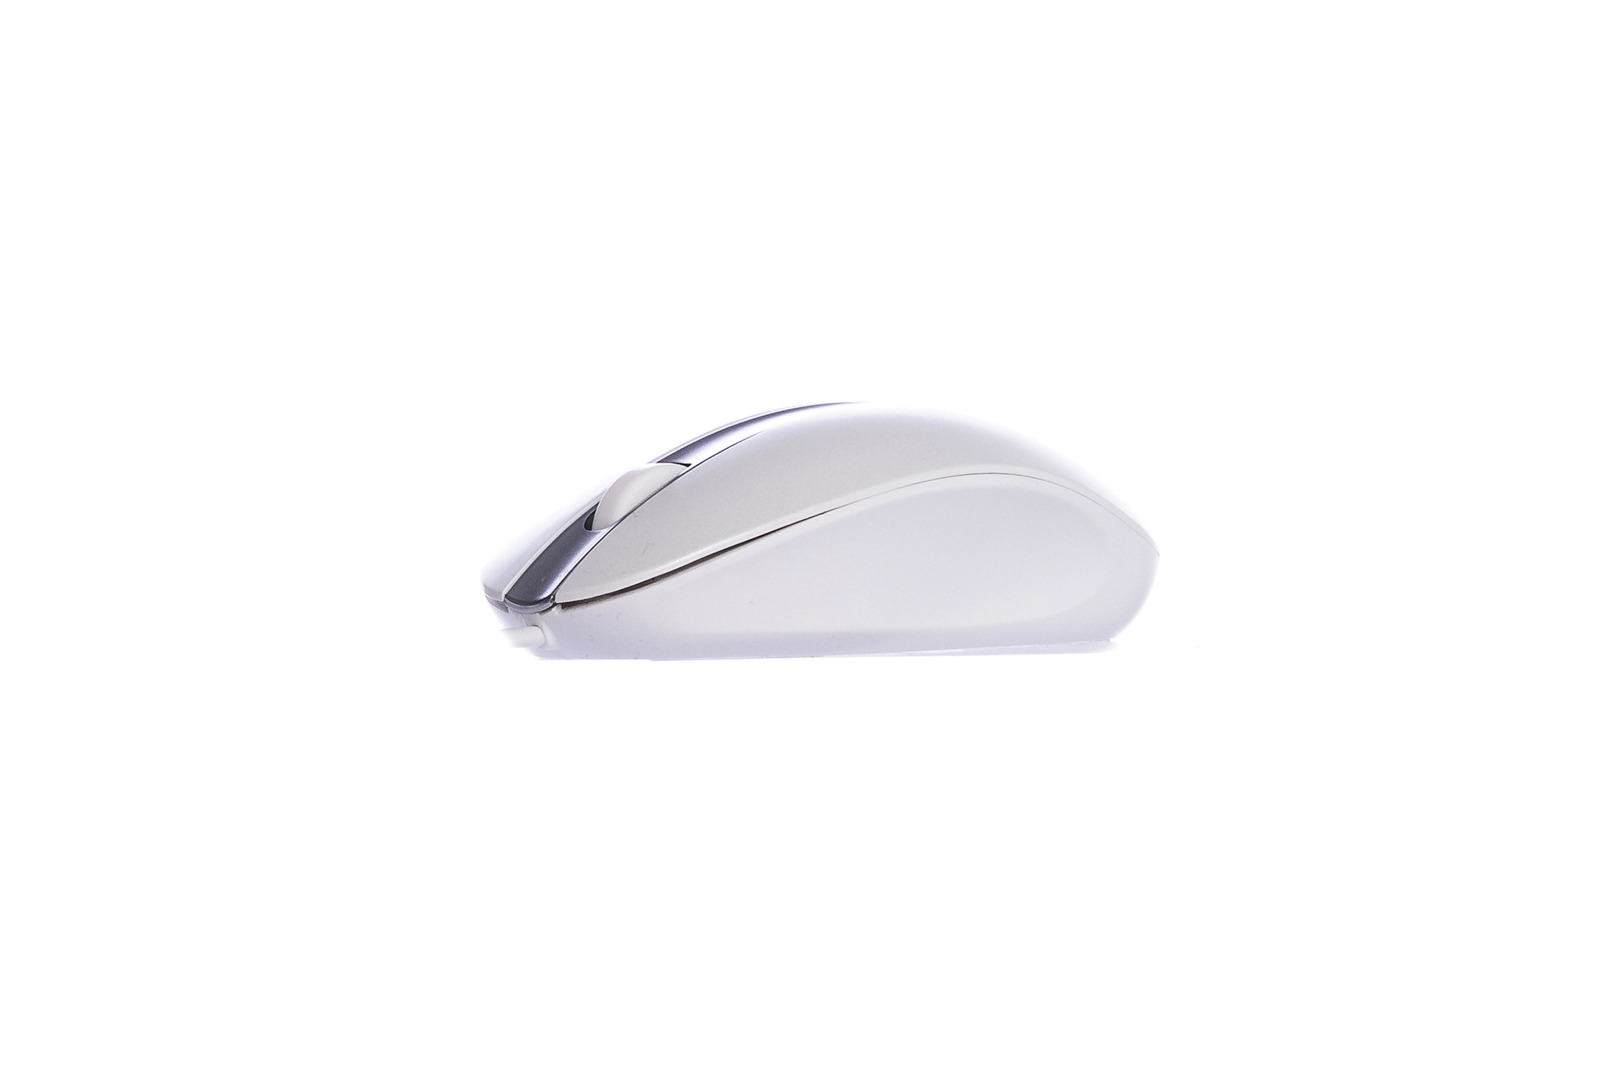 Optical Mouse Lenovo White (Unboxed)